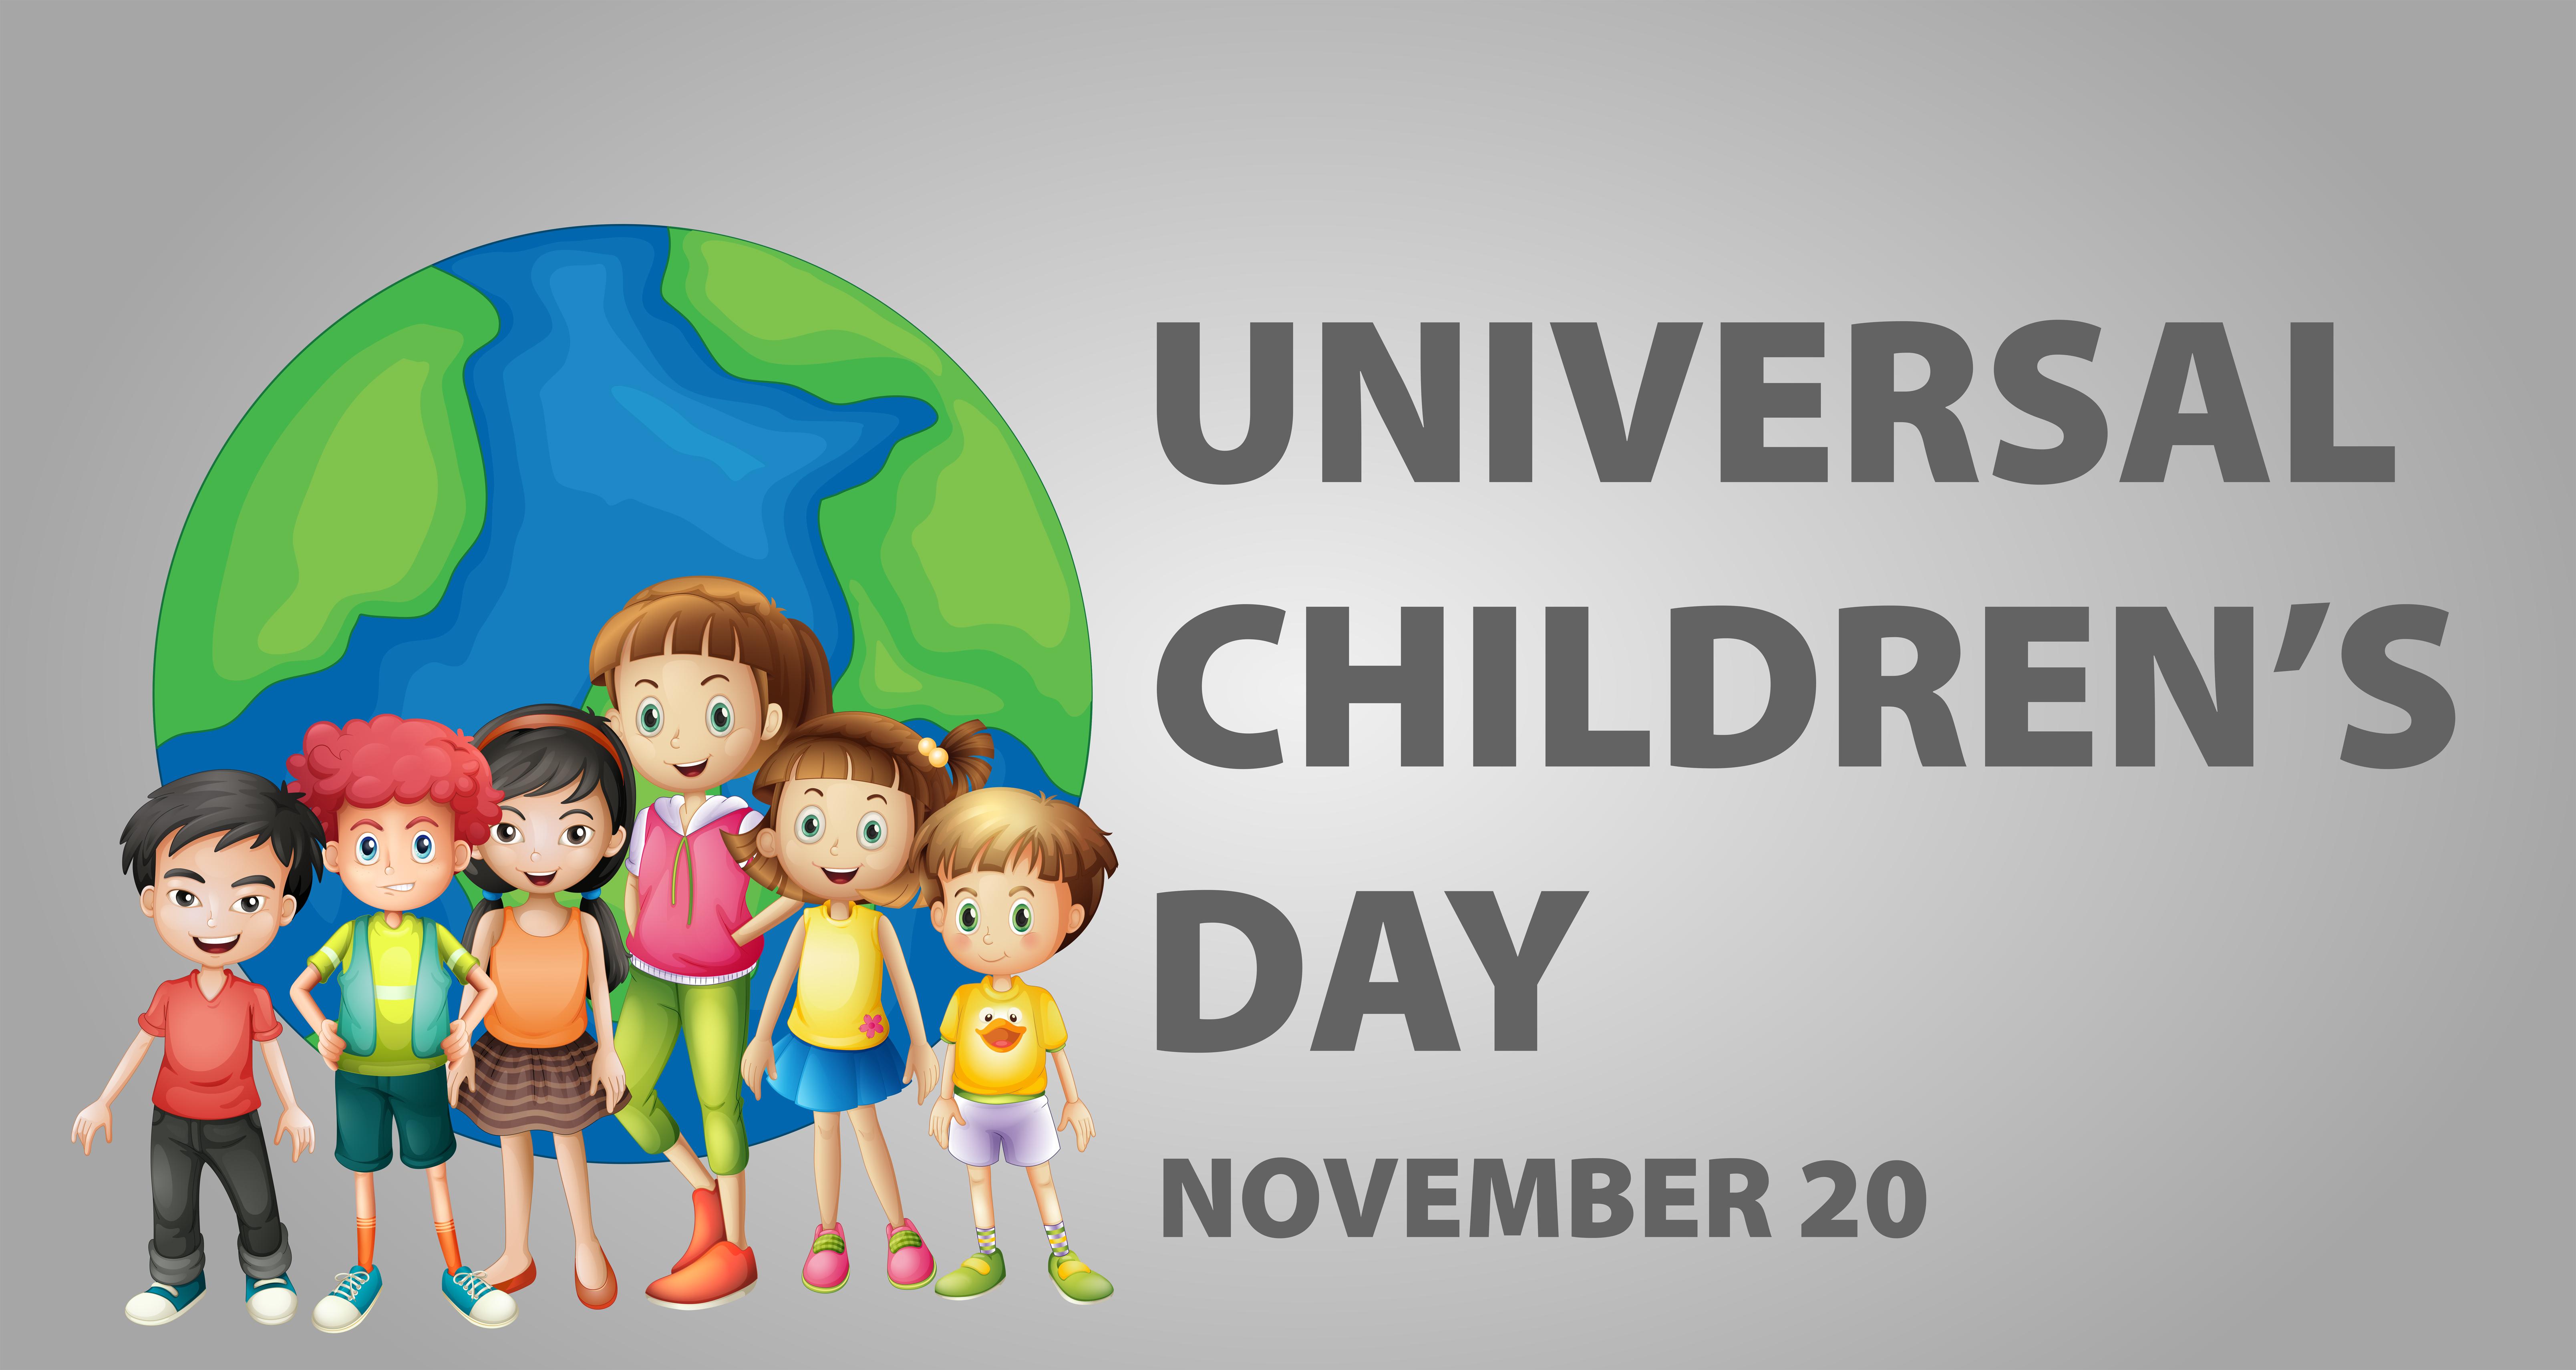 ecua universal childrens day - HD6432×3421